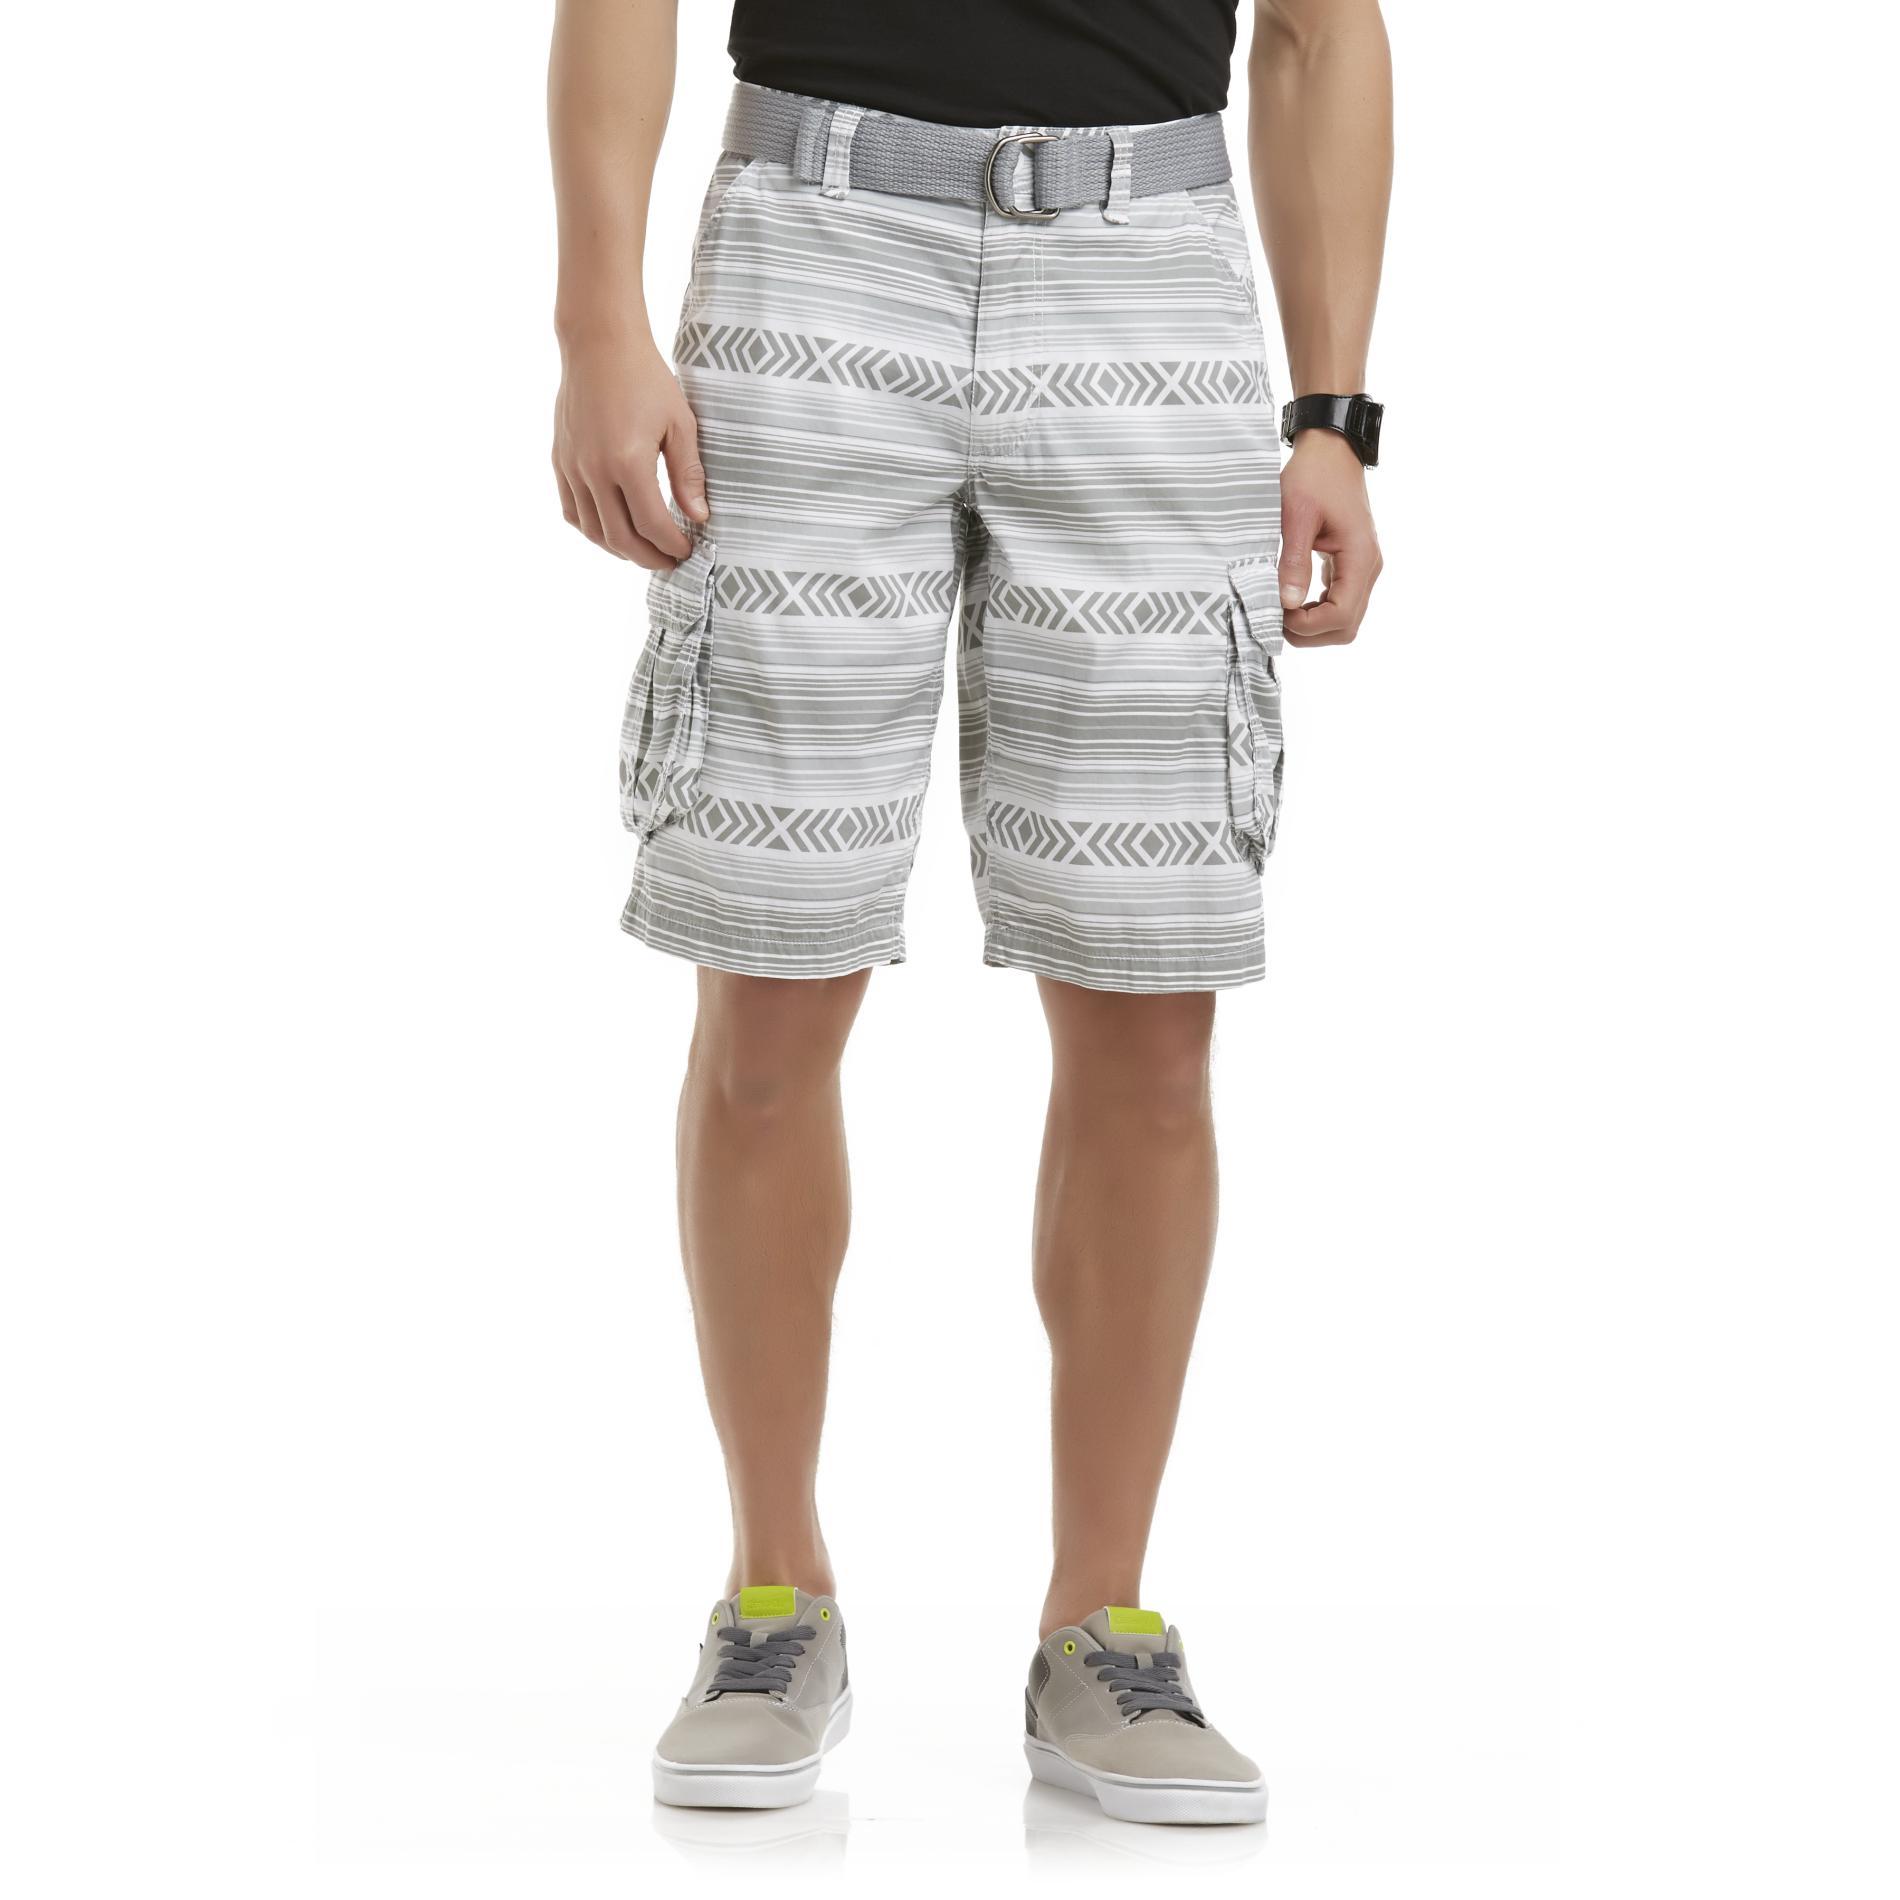 Men's Cargo Shorts & Fabric Belt - Tribal Striped